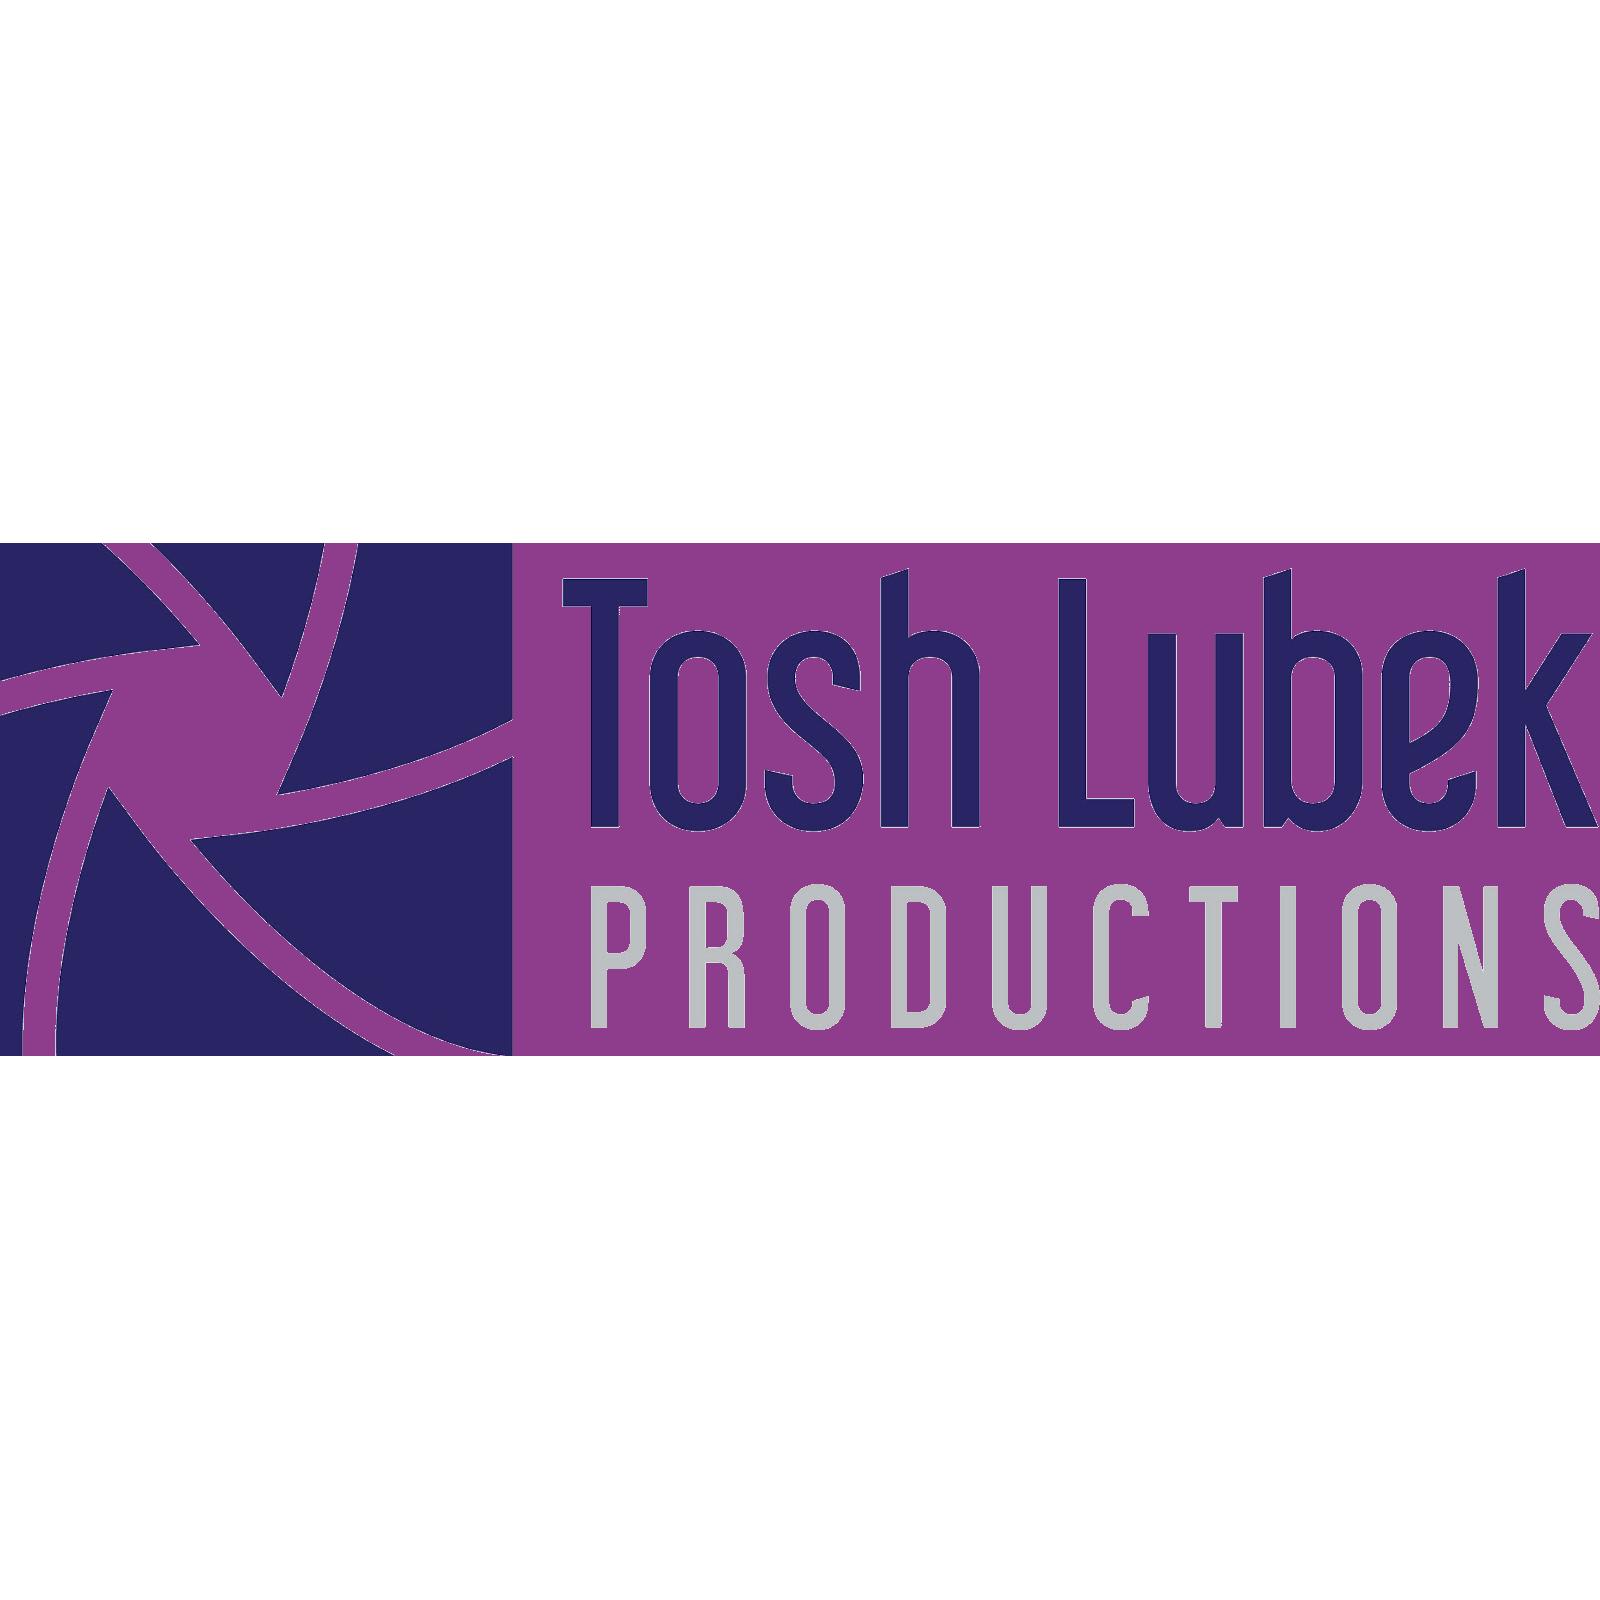 Tosh Lubek Productions sponsor Hashtag Events